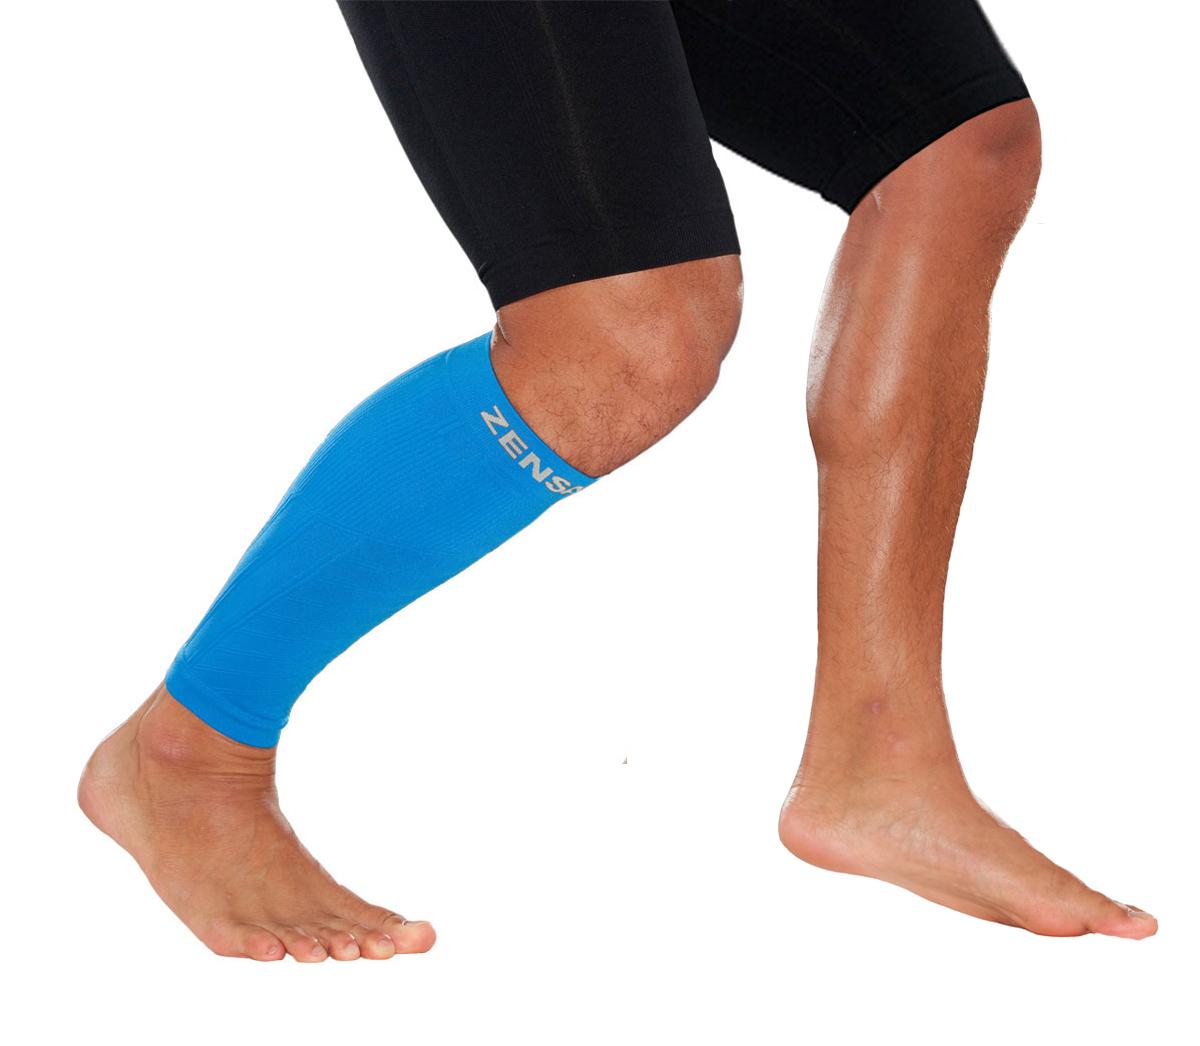 Suffering from shin splints? - Florida Health Care News